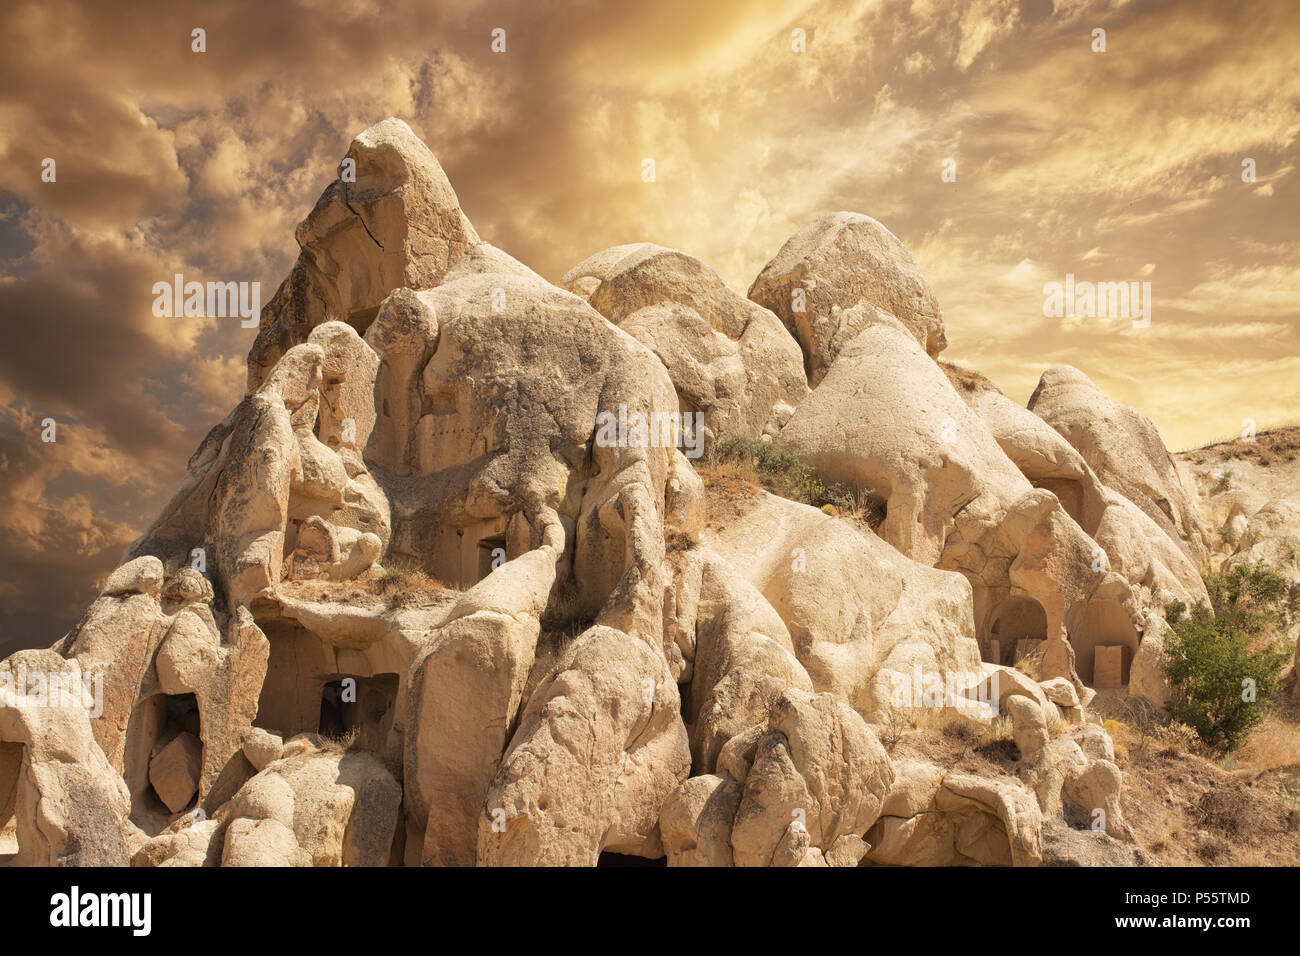 Impressive fungous forms of sandstone in the canyon near Cavusin village, Cappadocia, Nevsehir Province, Anatolia Region of Turkey - Stock Image